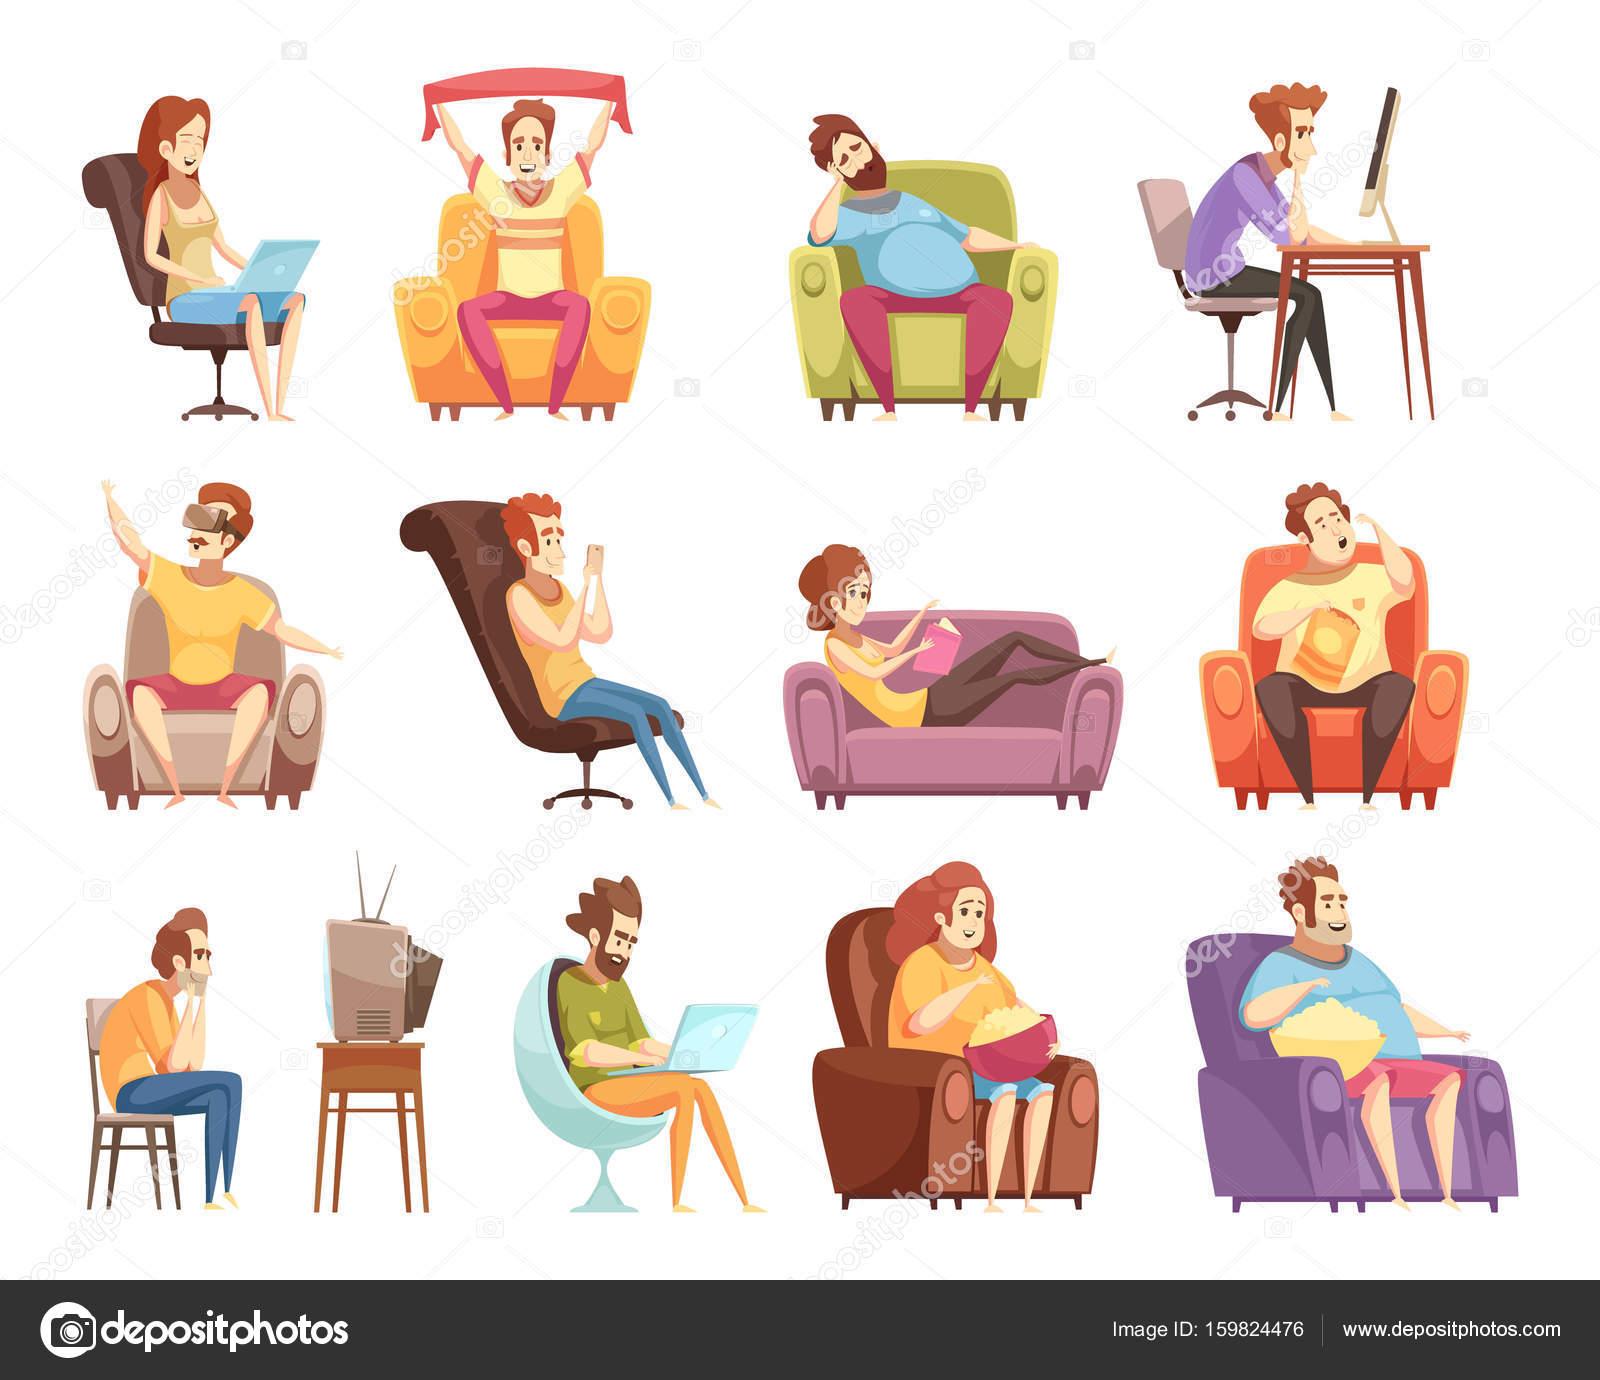 Sedentary Lifestyle: Sedentary Lifestyle Retro Cartoon Icons Set